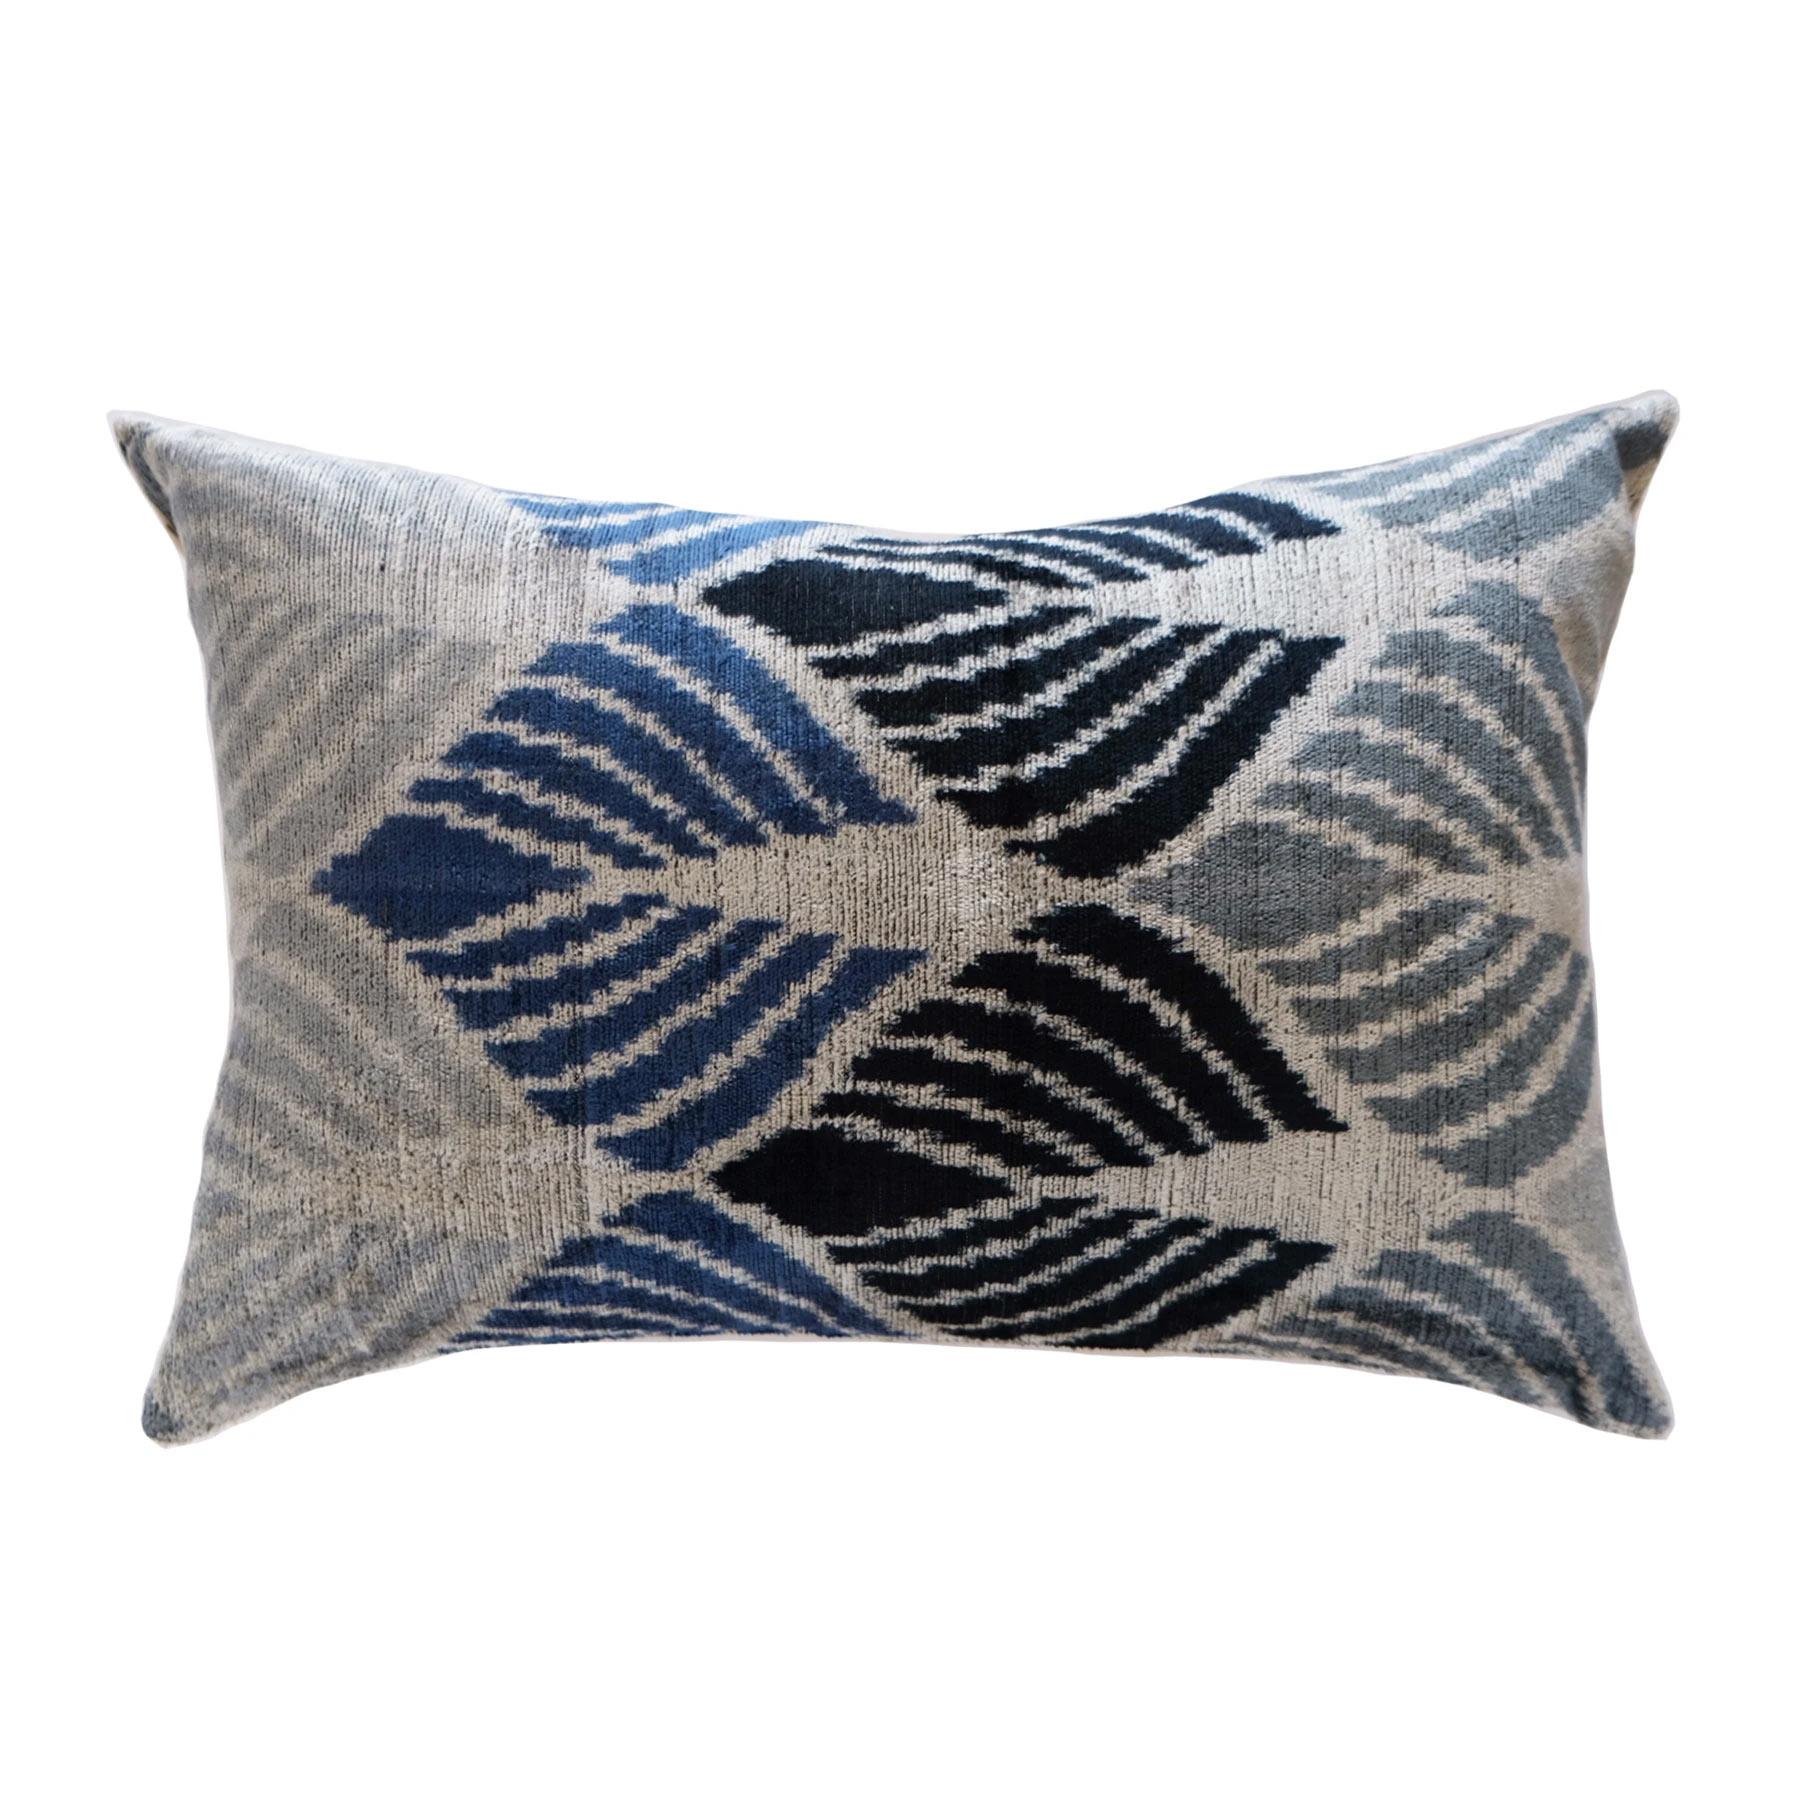 Classic blue silk accent lumbar throw pillow - affiliate link